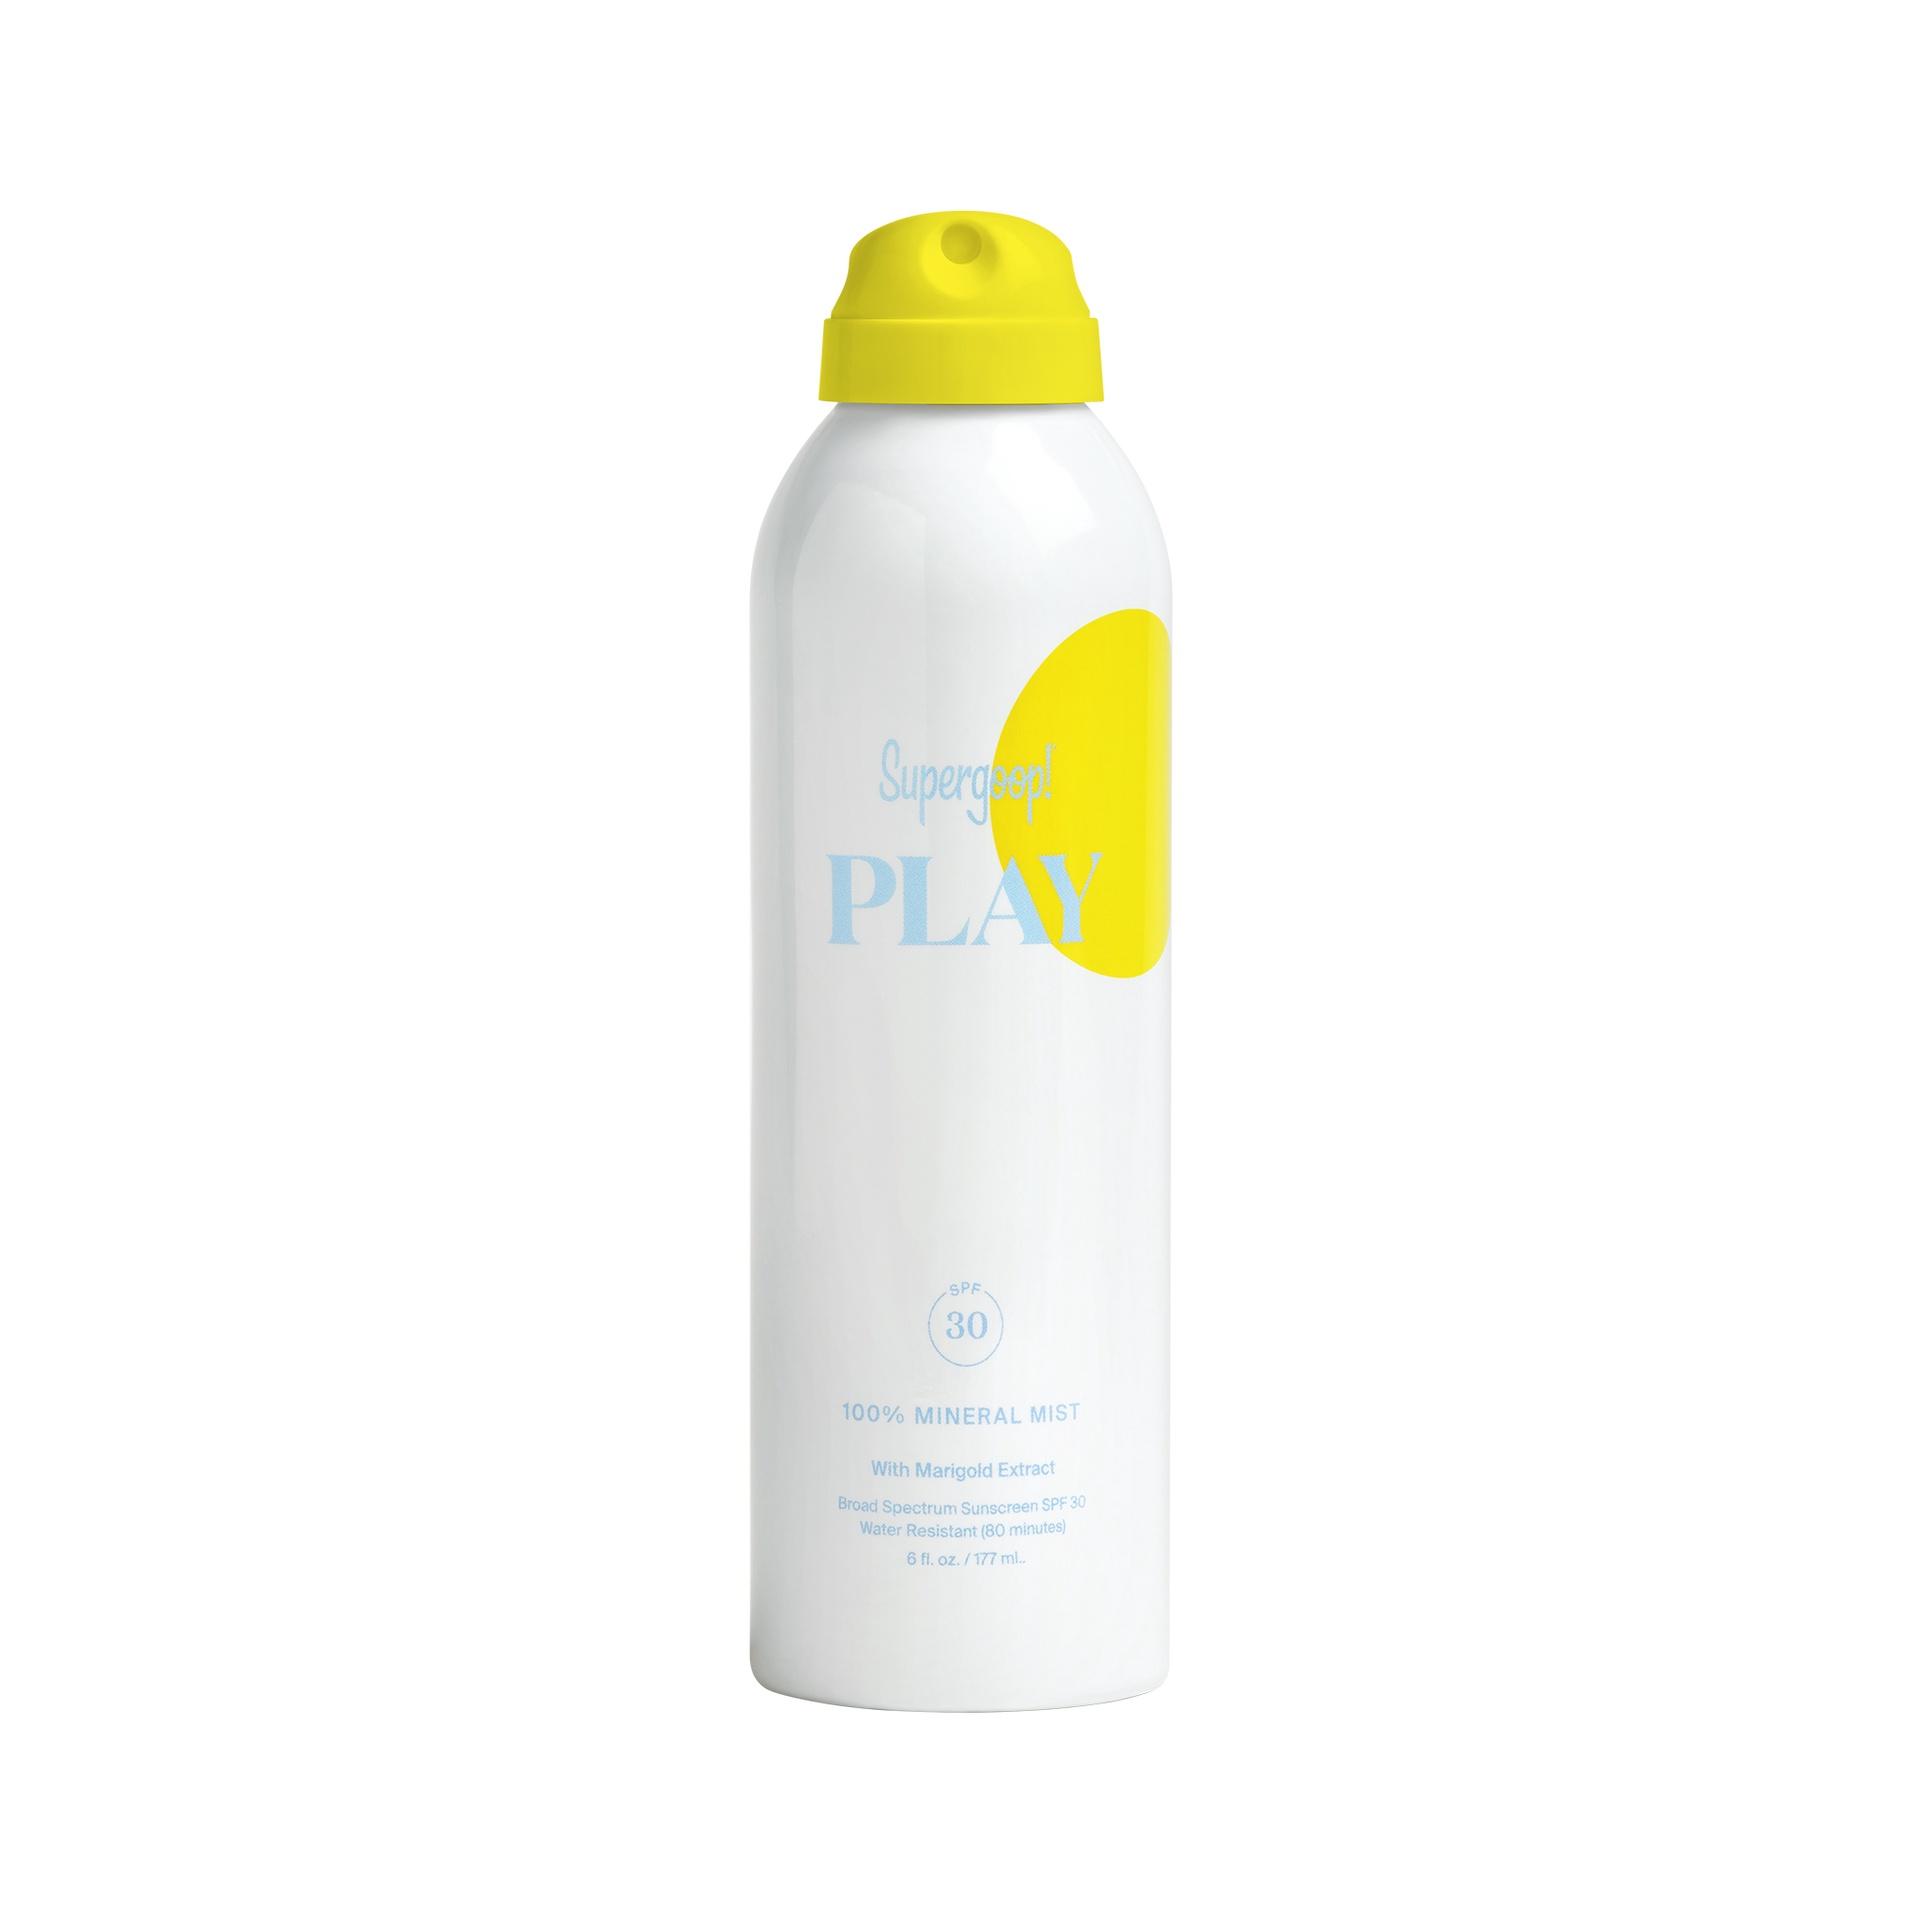 PLAY 100% Mineral Body Mist SPF 30